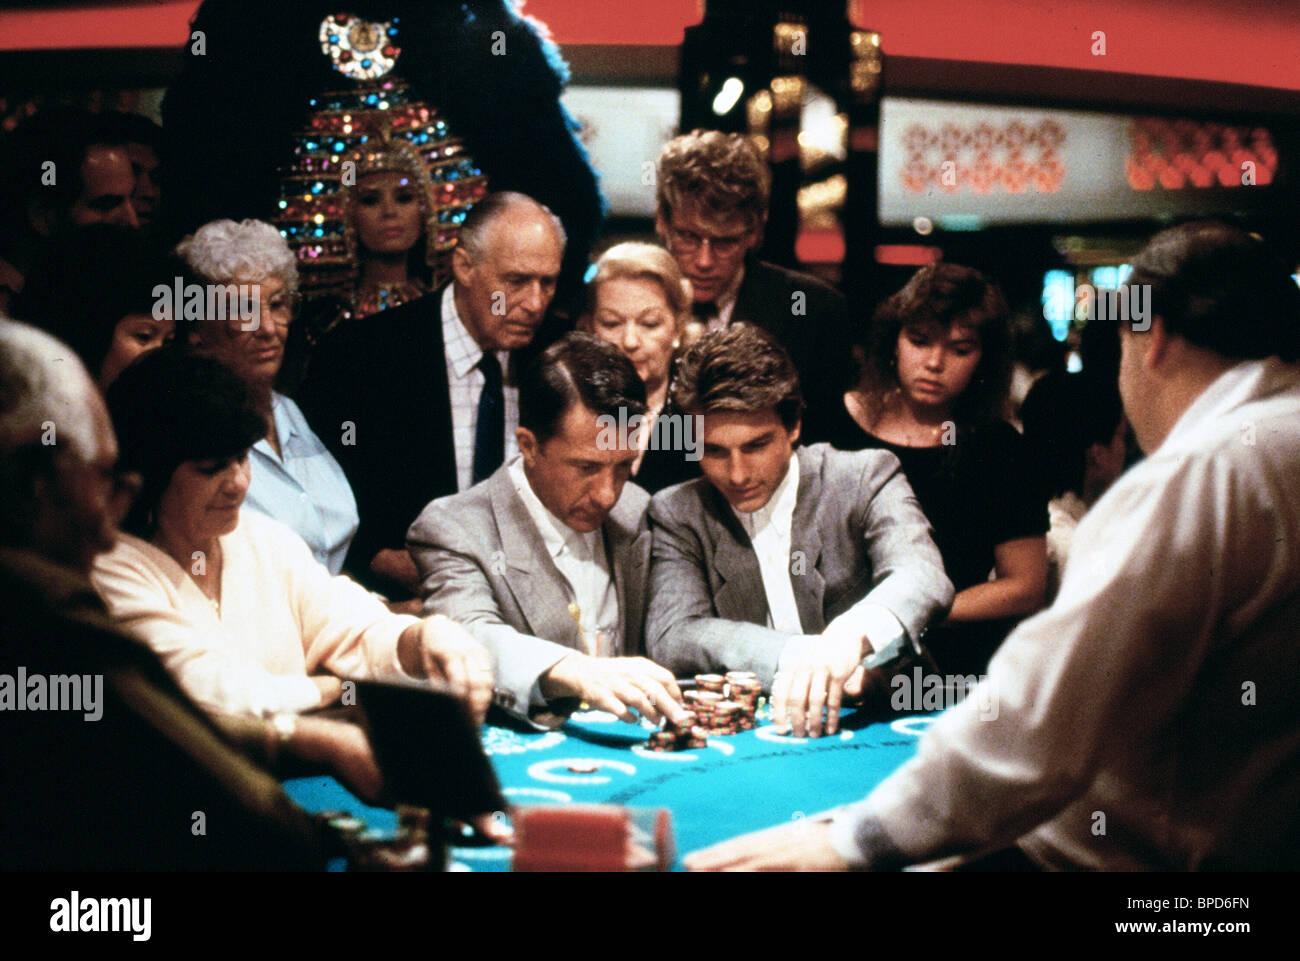 Gambling population statistics